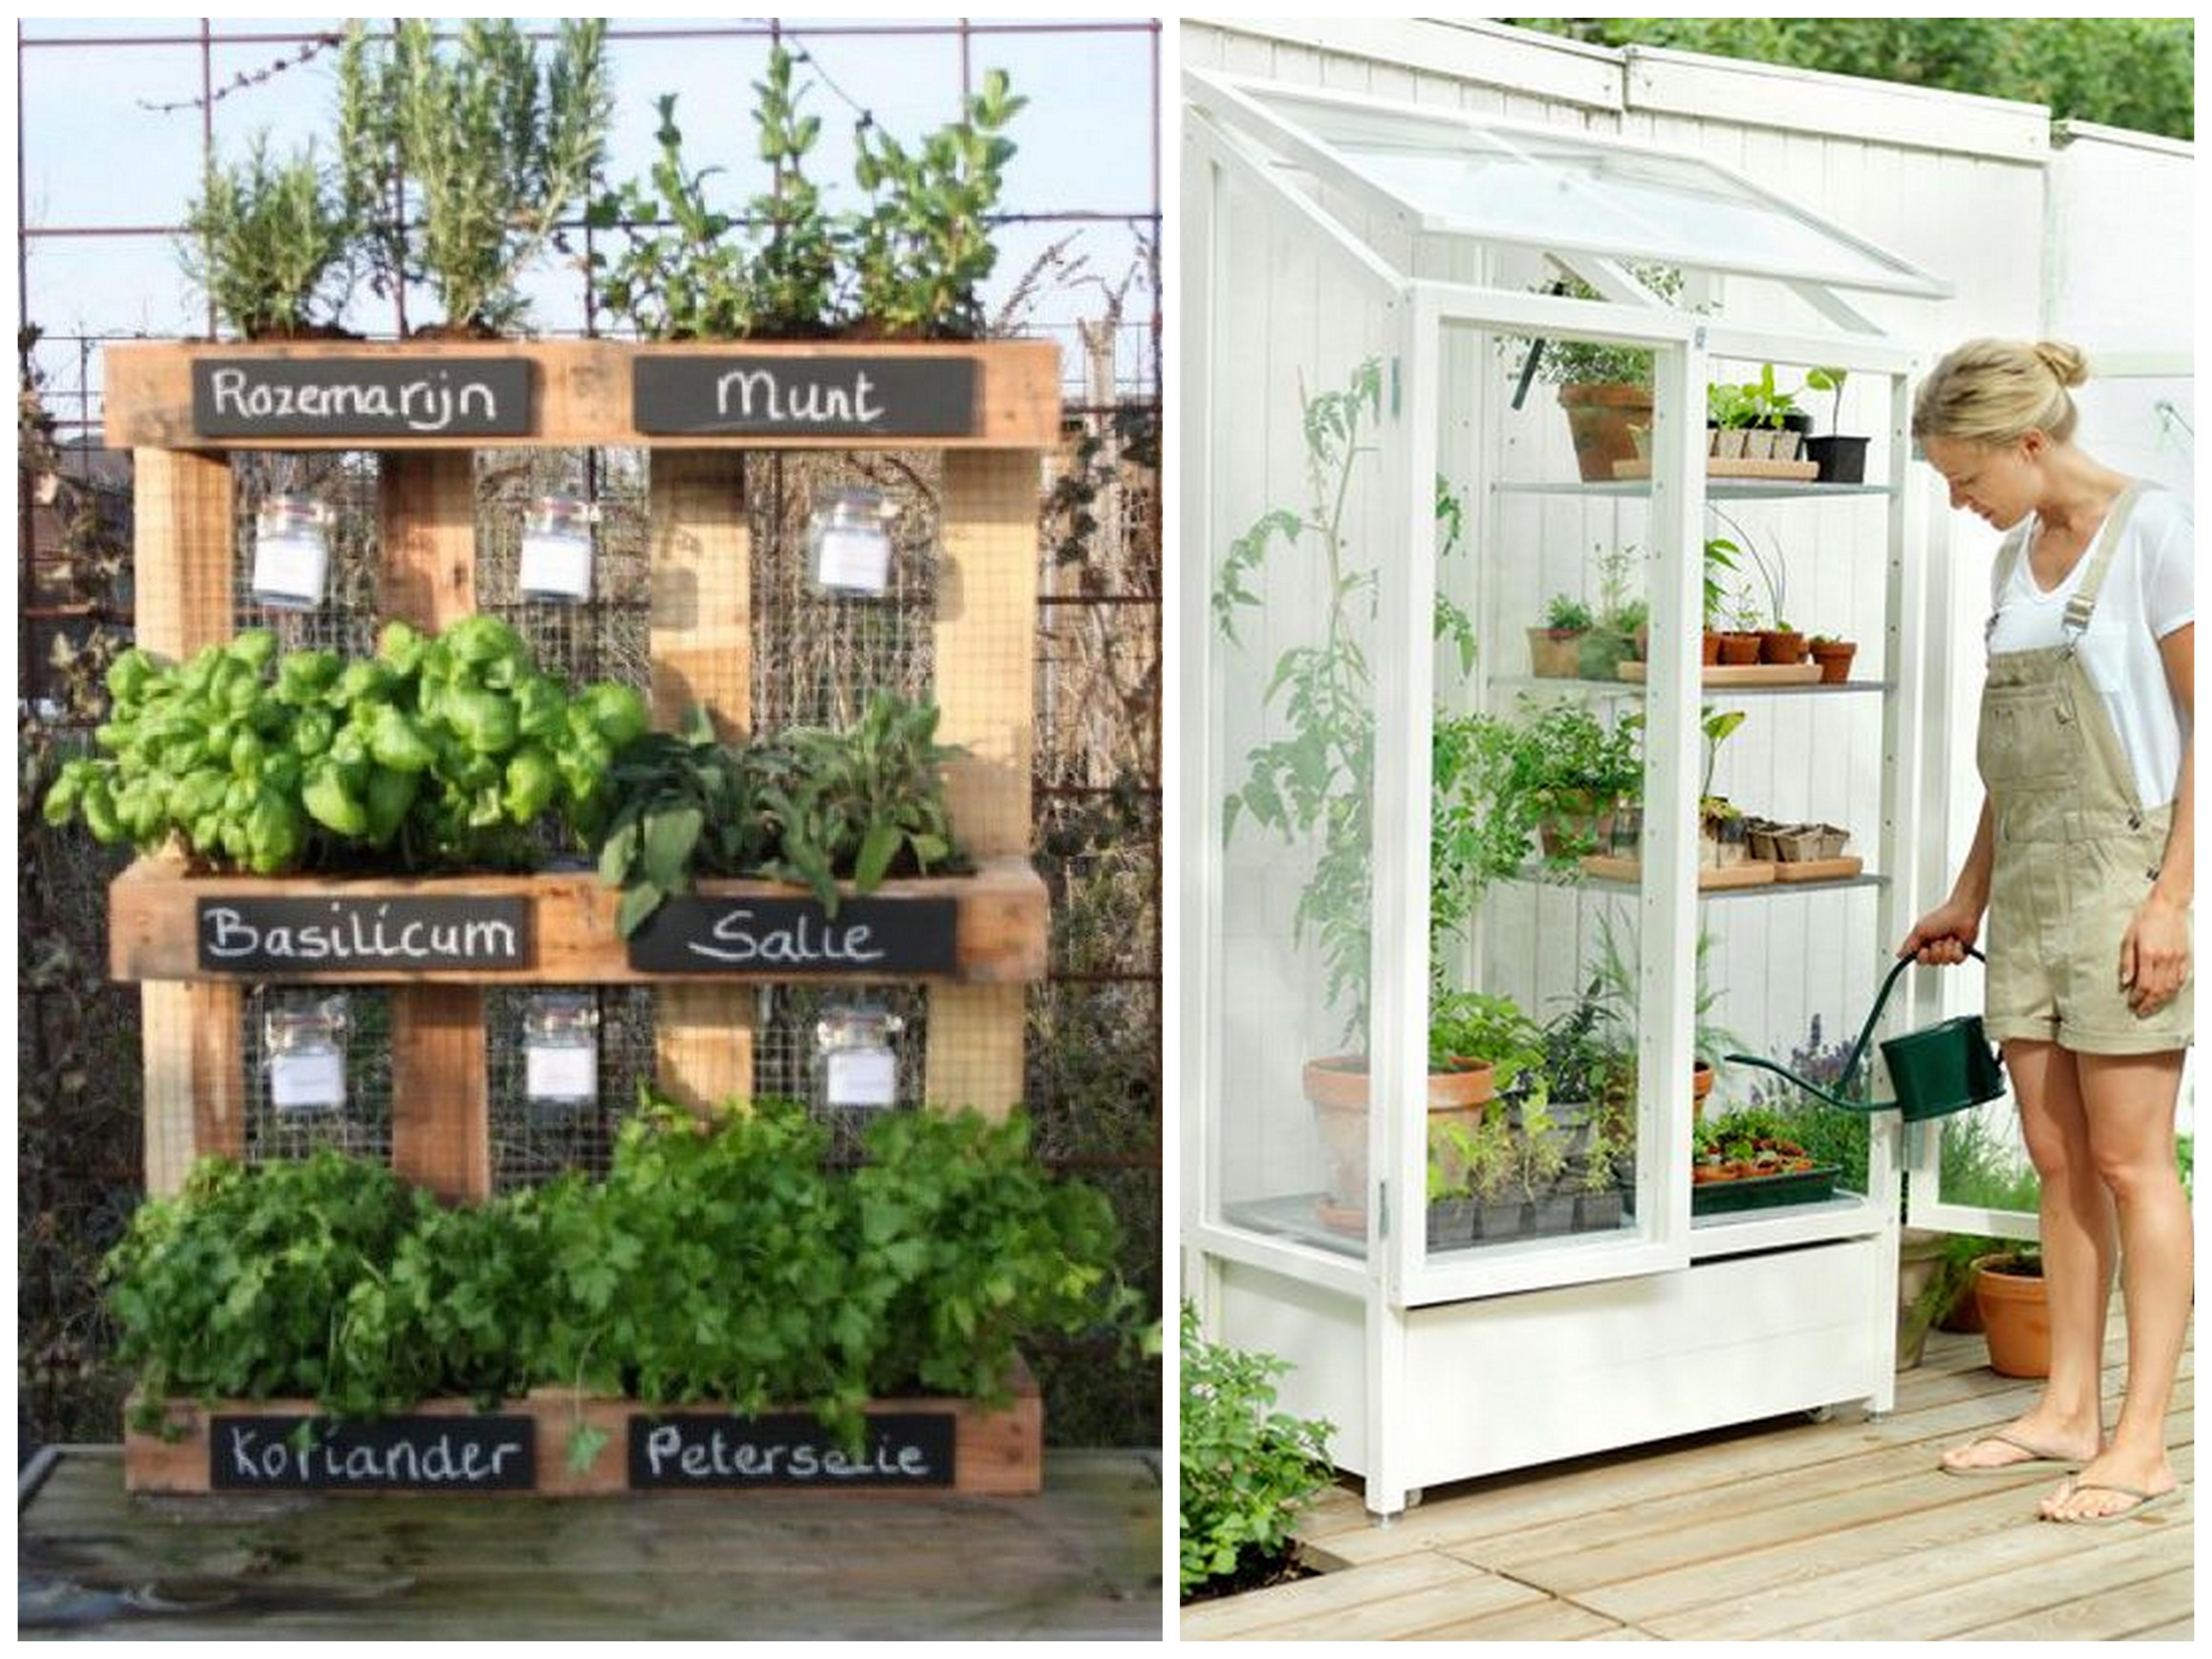 Budget tuin ideeen google zoeken tuin gärten